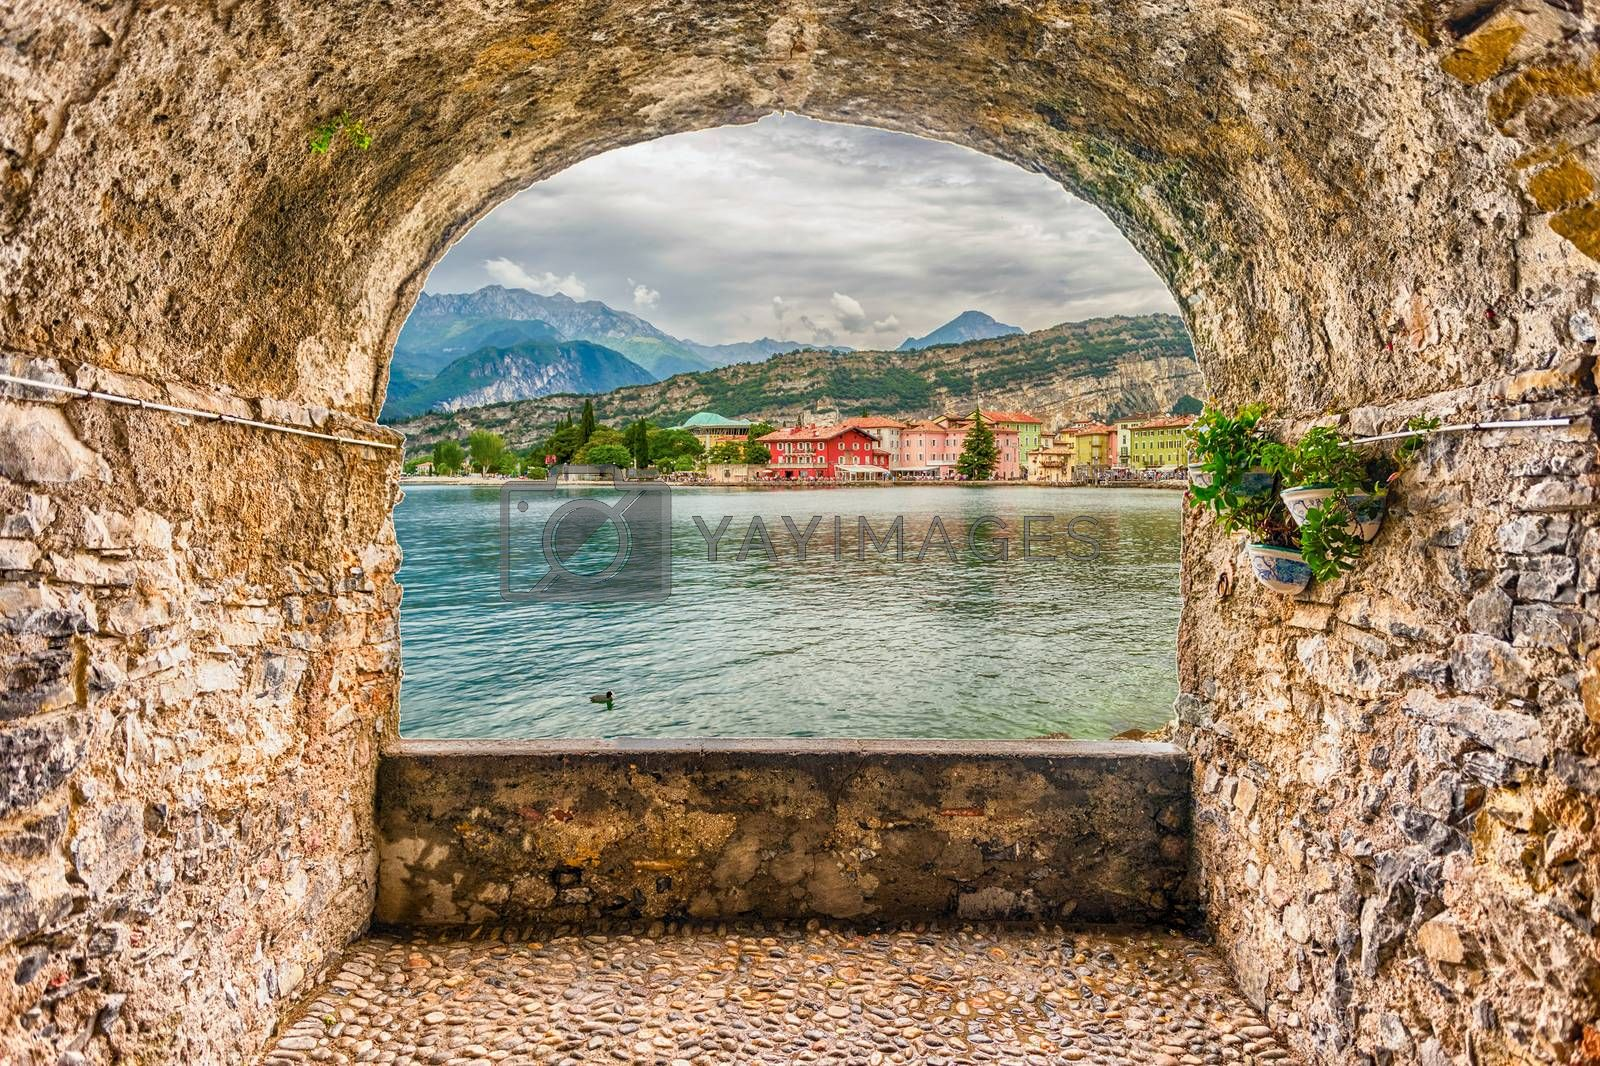 Scenic rock arch balcony overlooking the village of Torbole, lakeside, Lake Garda, Italy